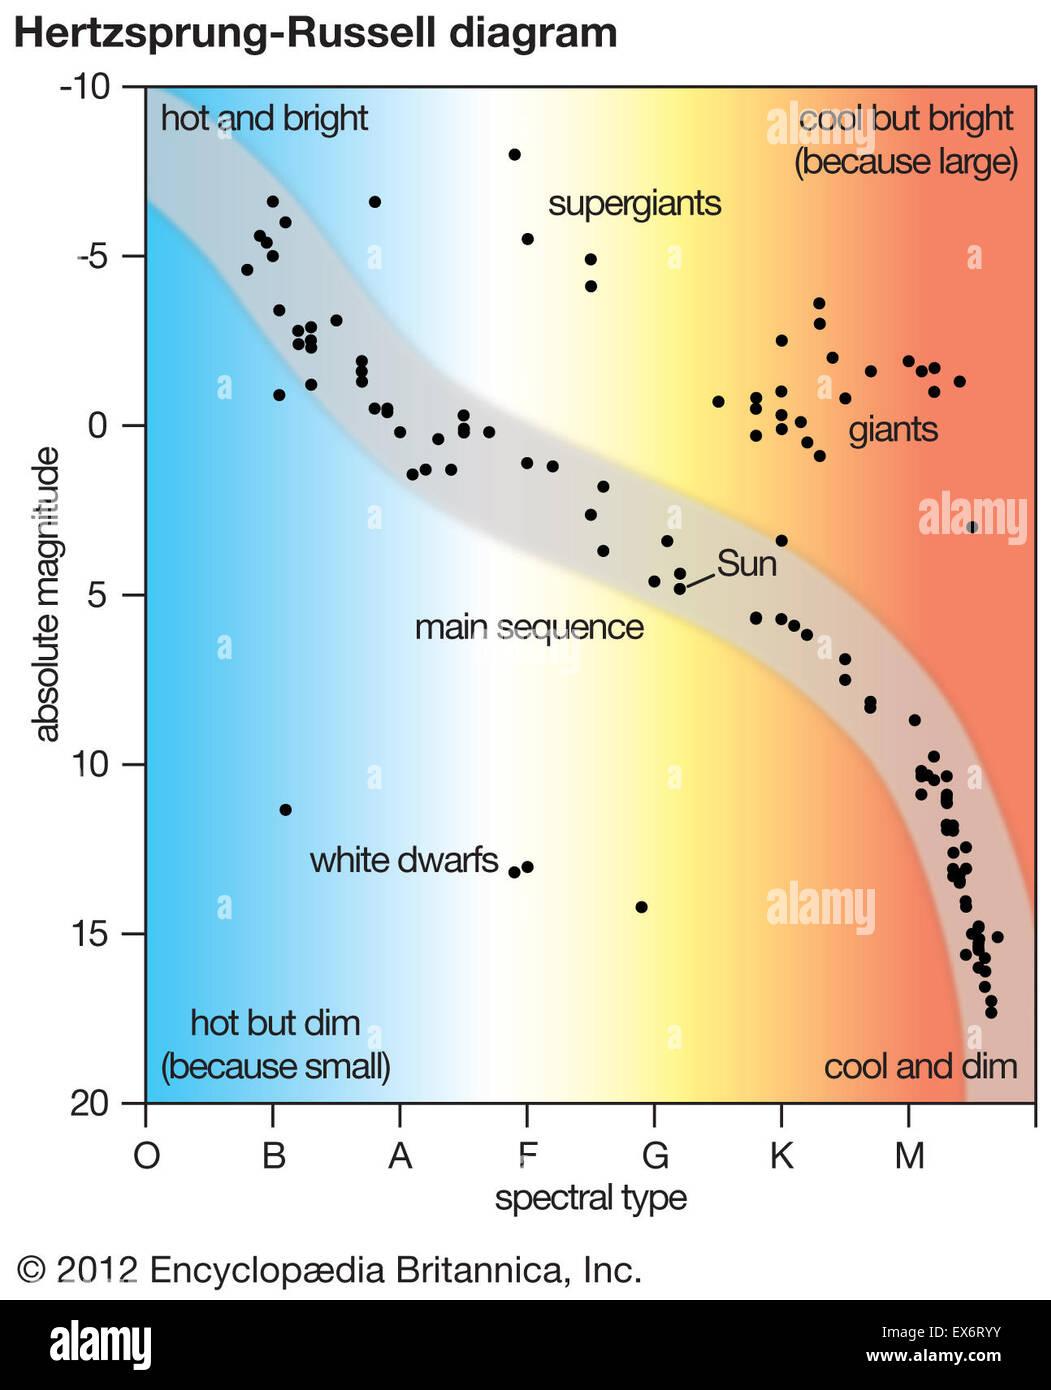 Hertzsprung russell diagram stock photo 84973055 alamy hertzsprung russell diagram pooptronica Choice Image